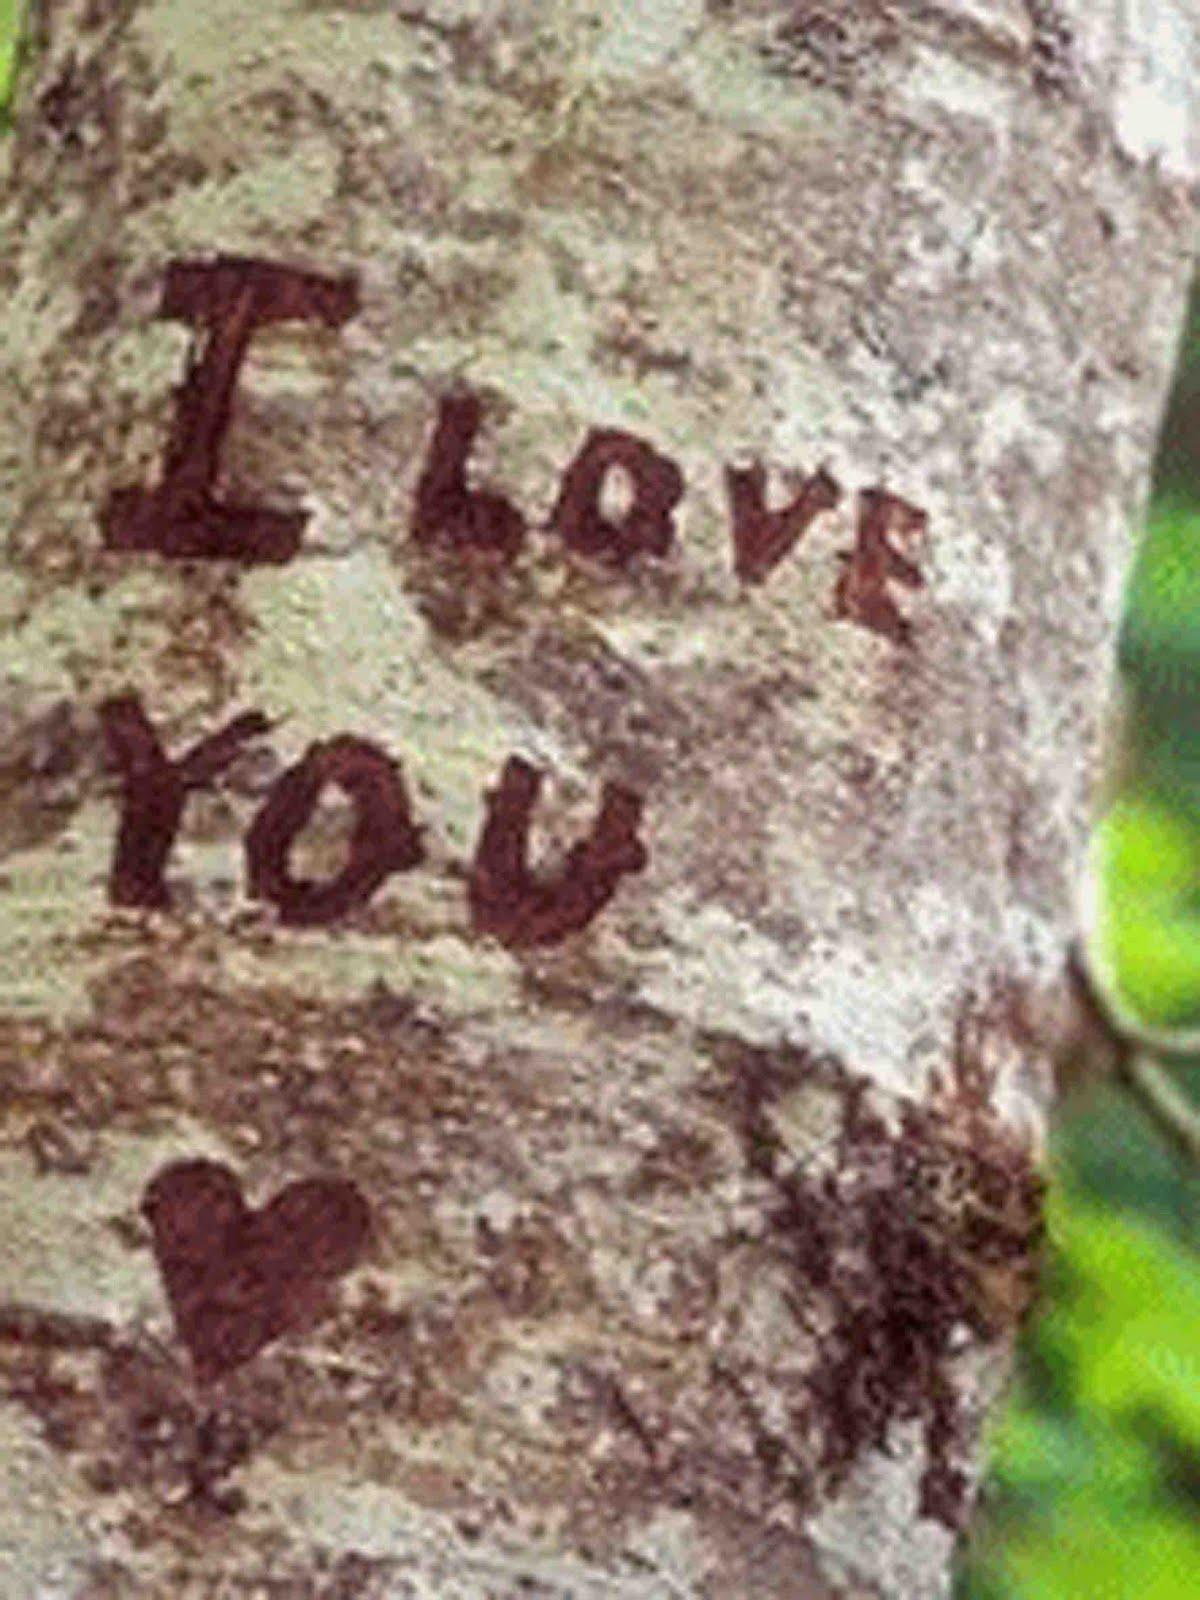 http://1.bp.blogspot.com/_XJpefzgJrLU/TB8YTjIBCyI/AAAAAAAAAz0/-O2DBGyp_xM/s1600/je-t-aime-sur-les-arbres_04.jpg